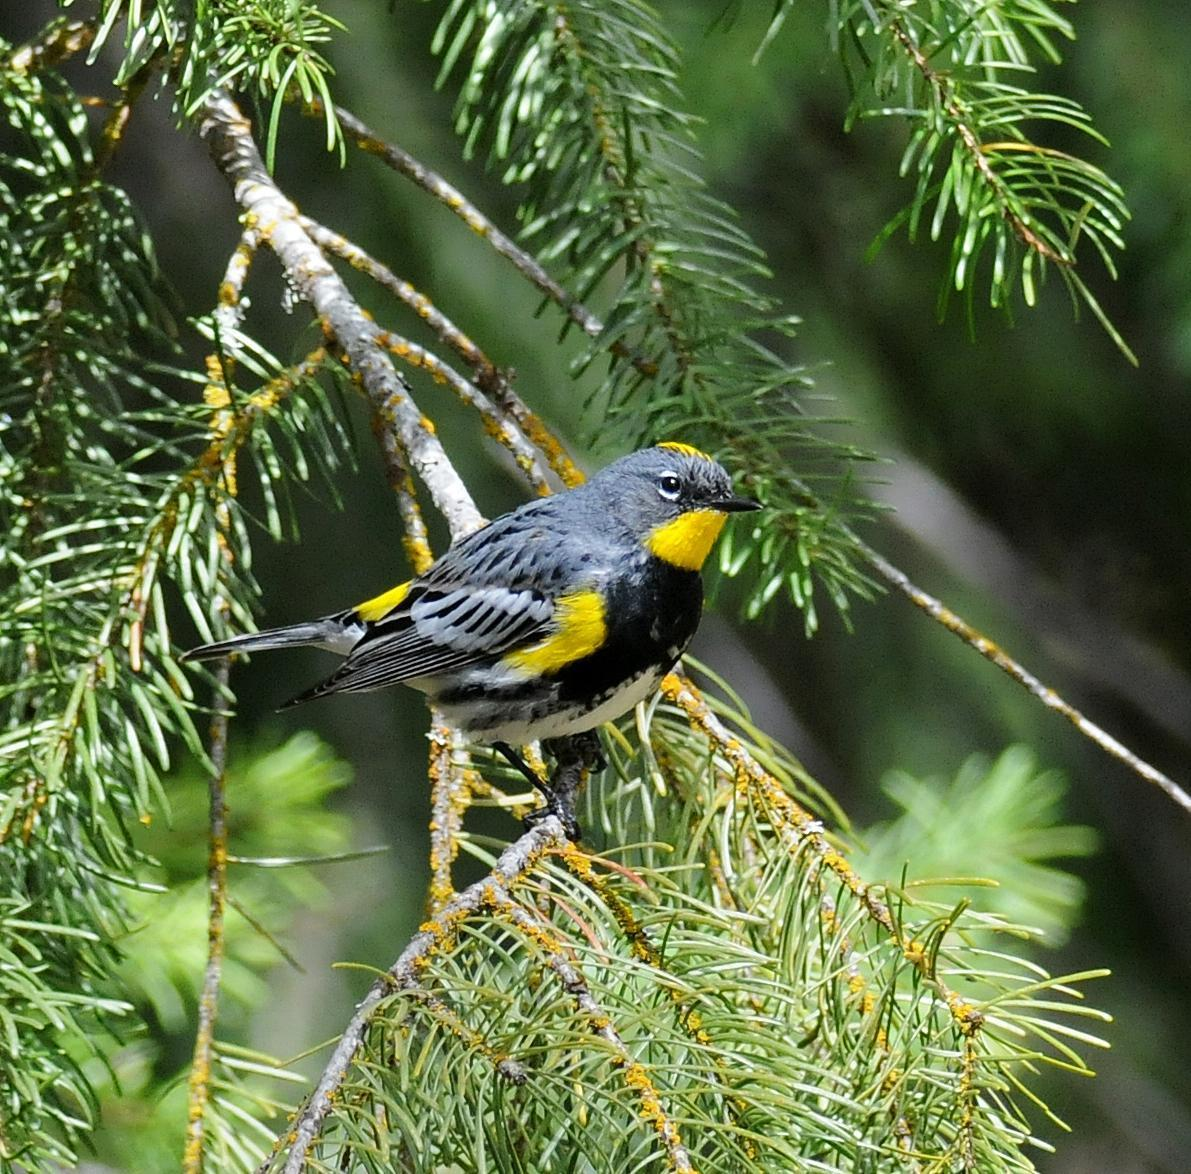 Yellow-rumped Warbler (Audubon's) Photo by Steven Mlodinow